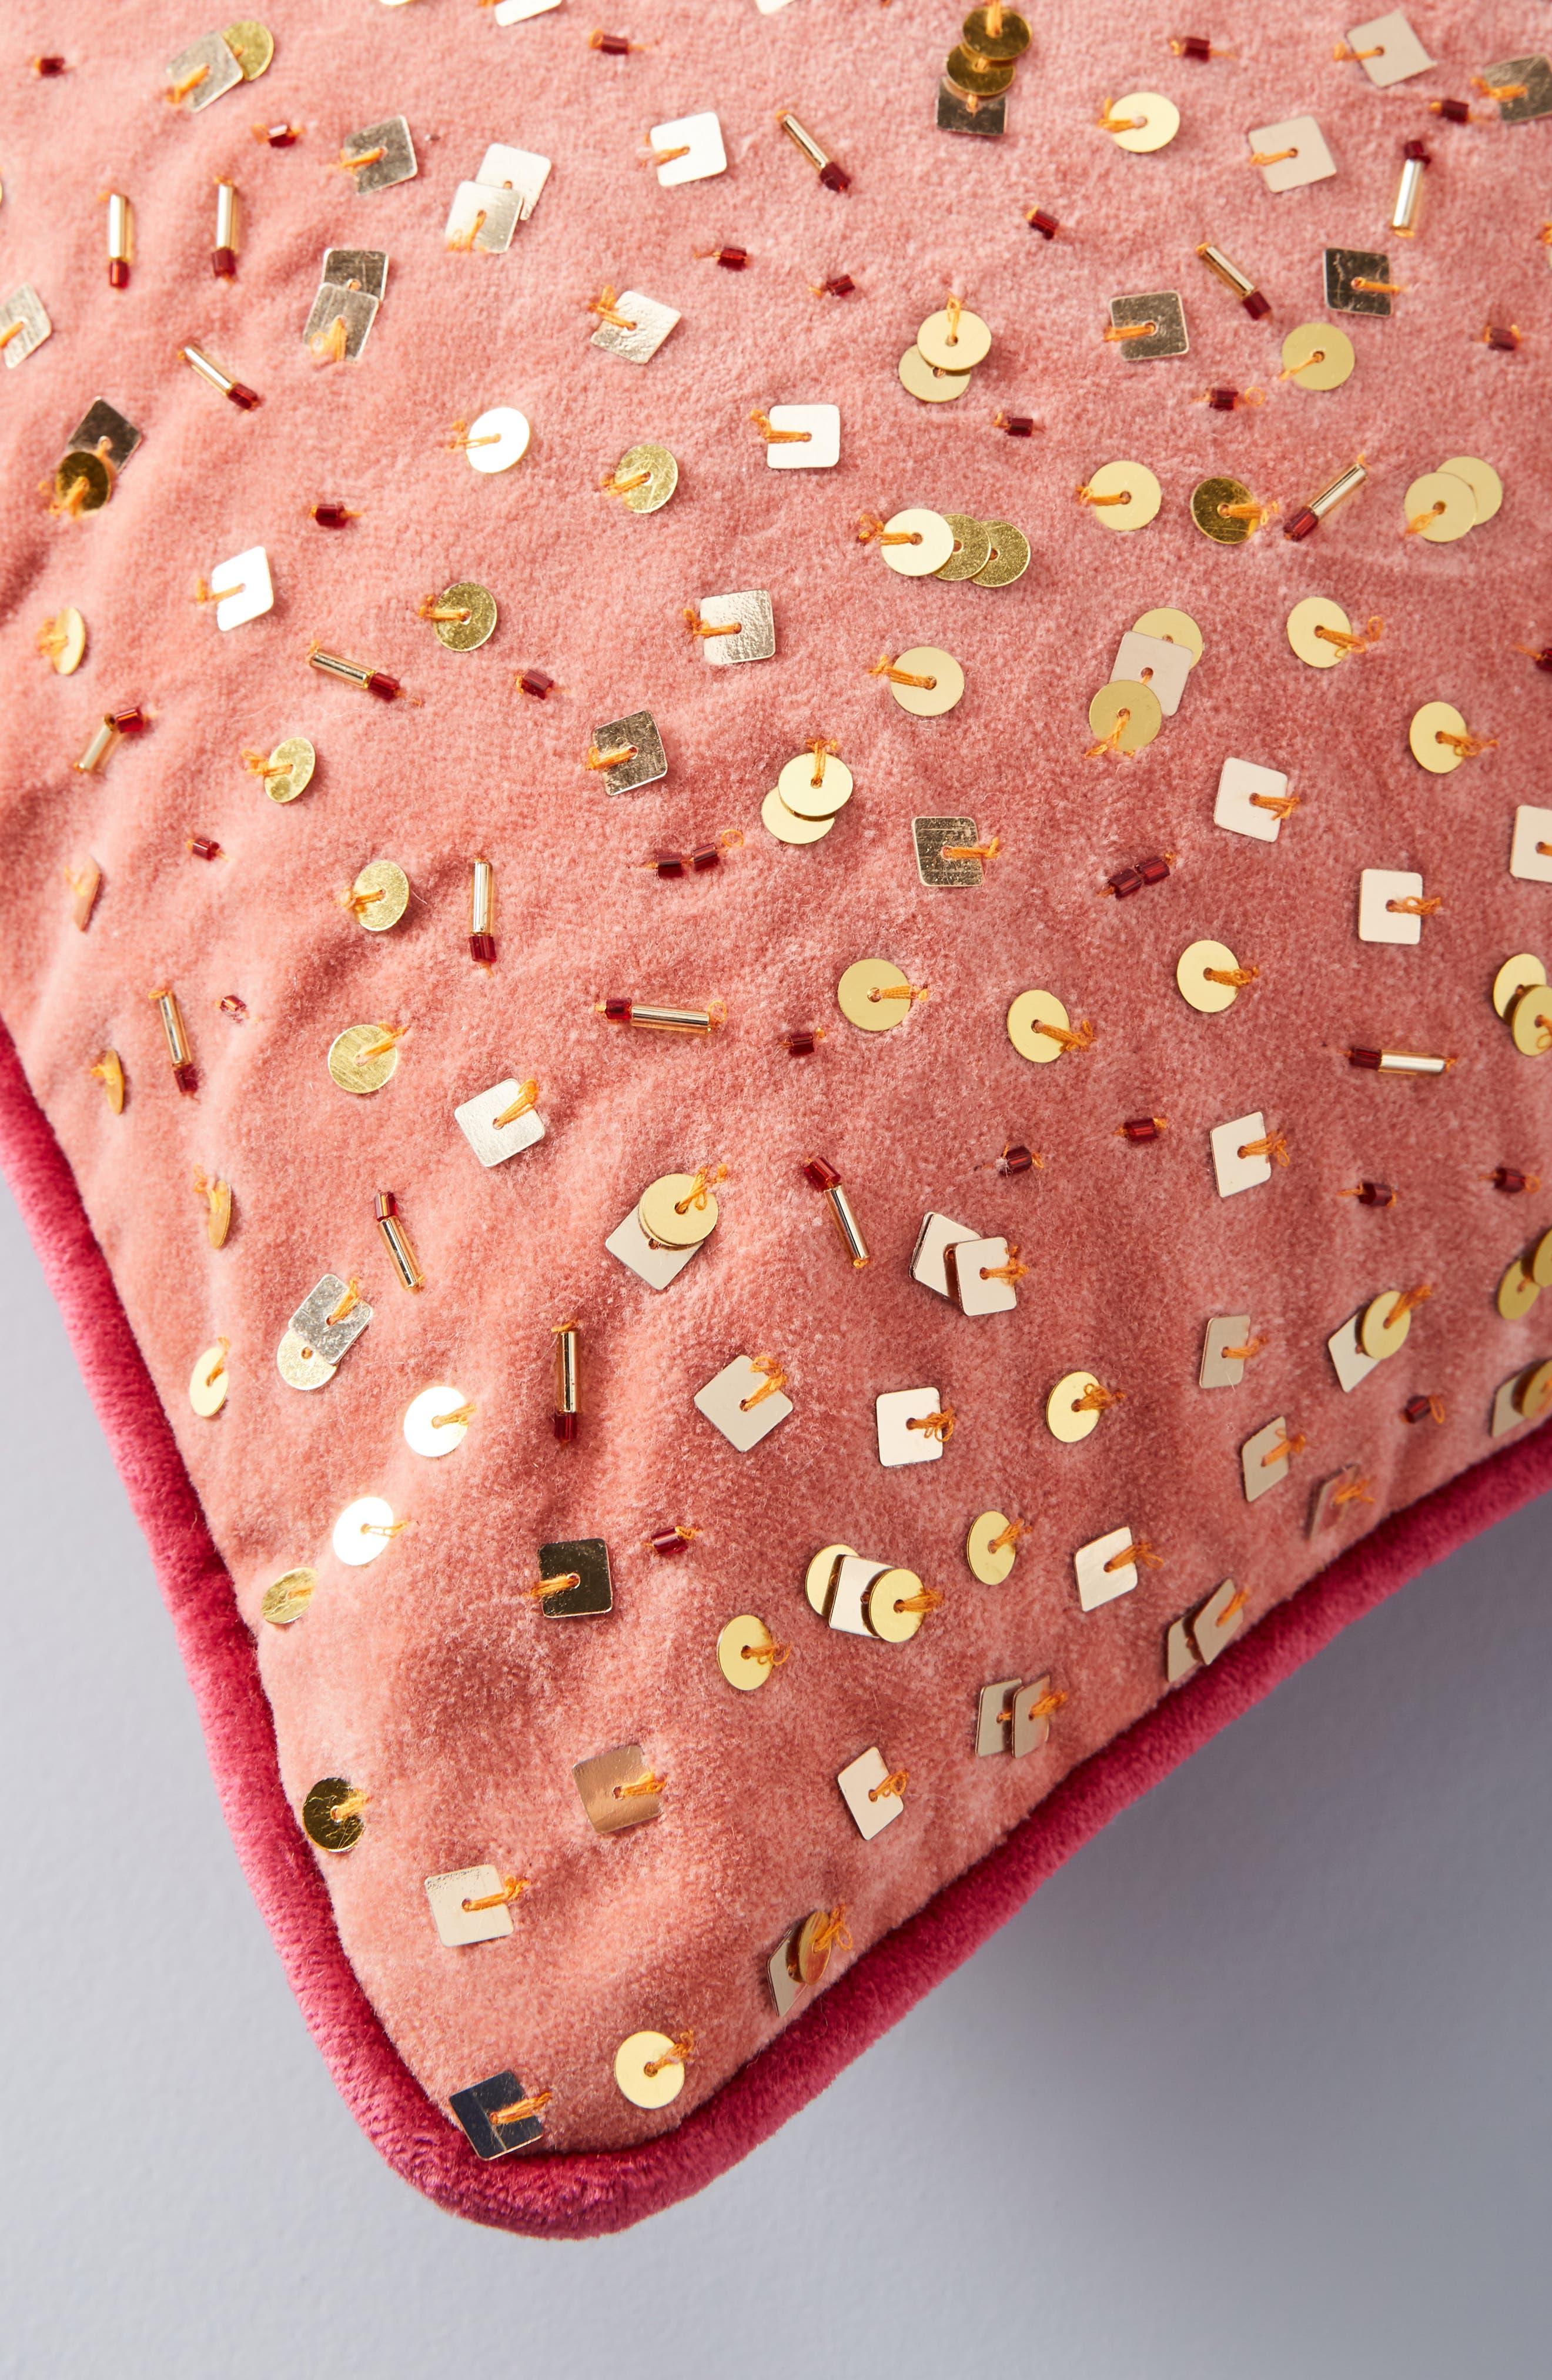 Confetti Velvet Accent Pillow,                             Alternate thumbnail 3, color,                             893